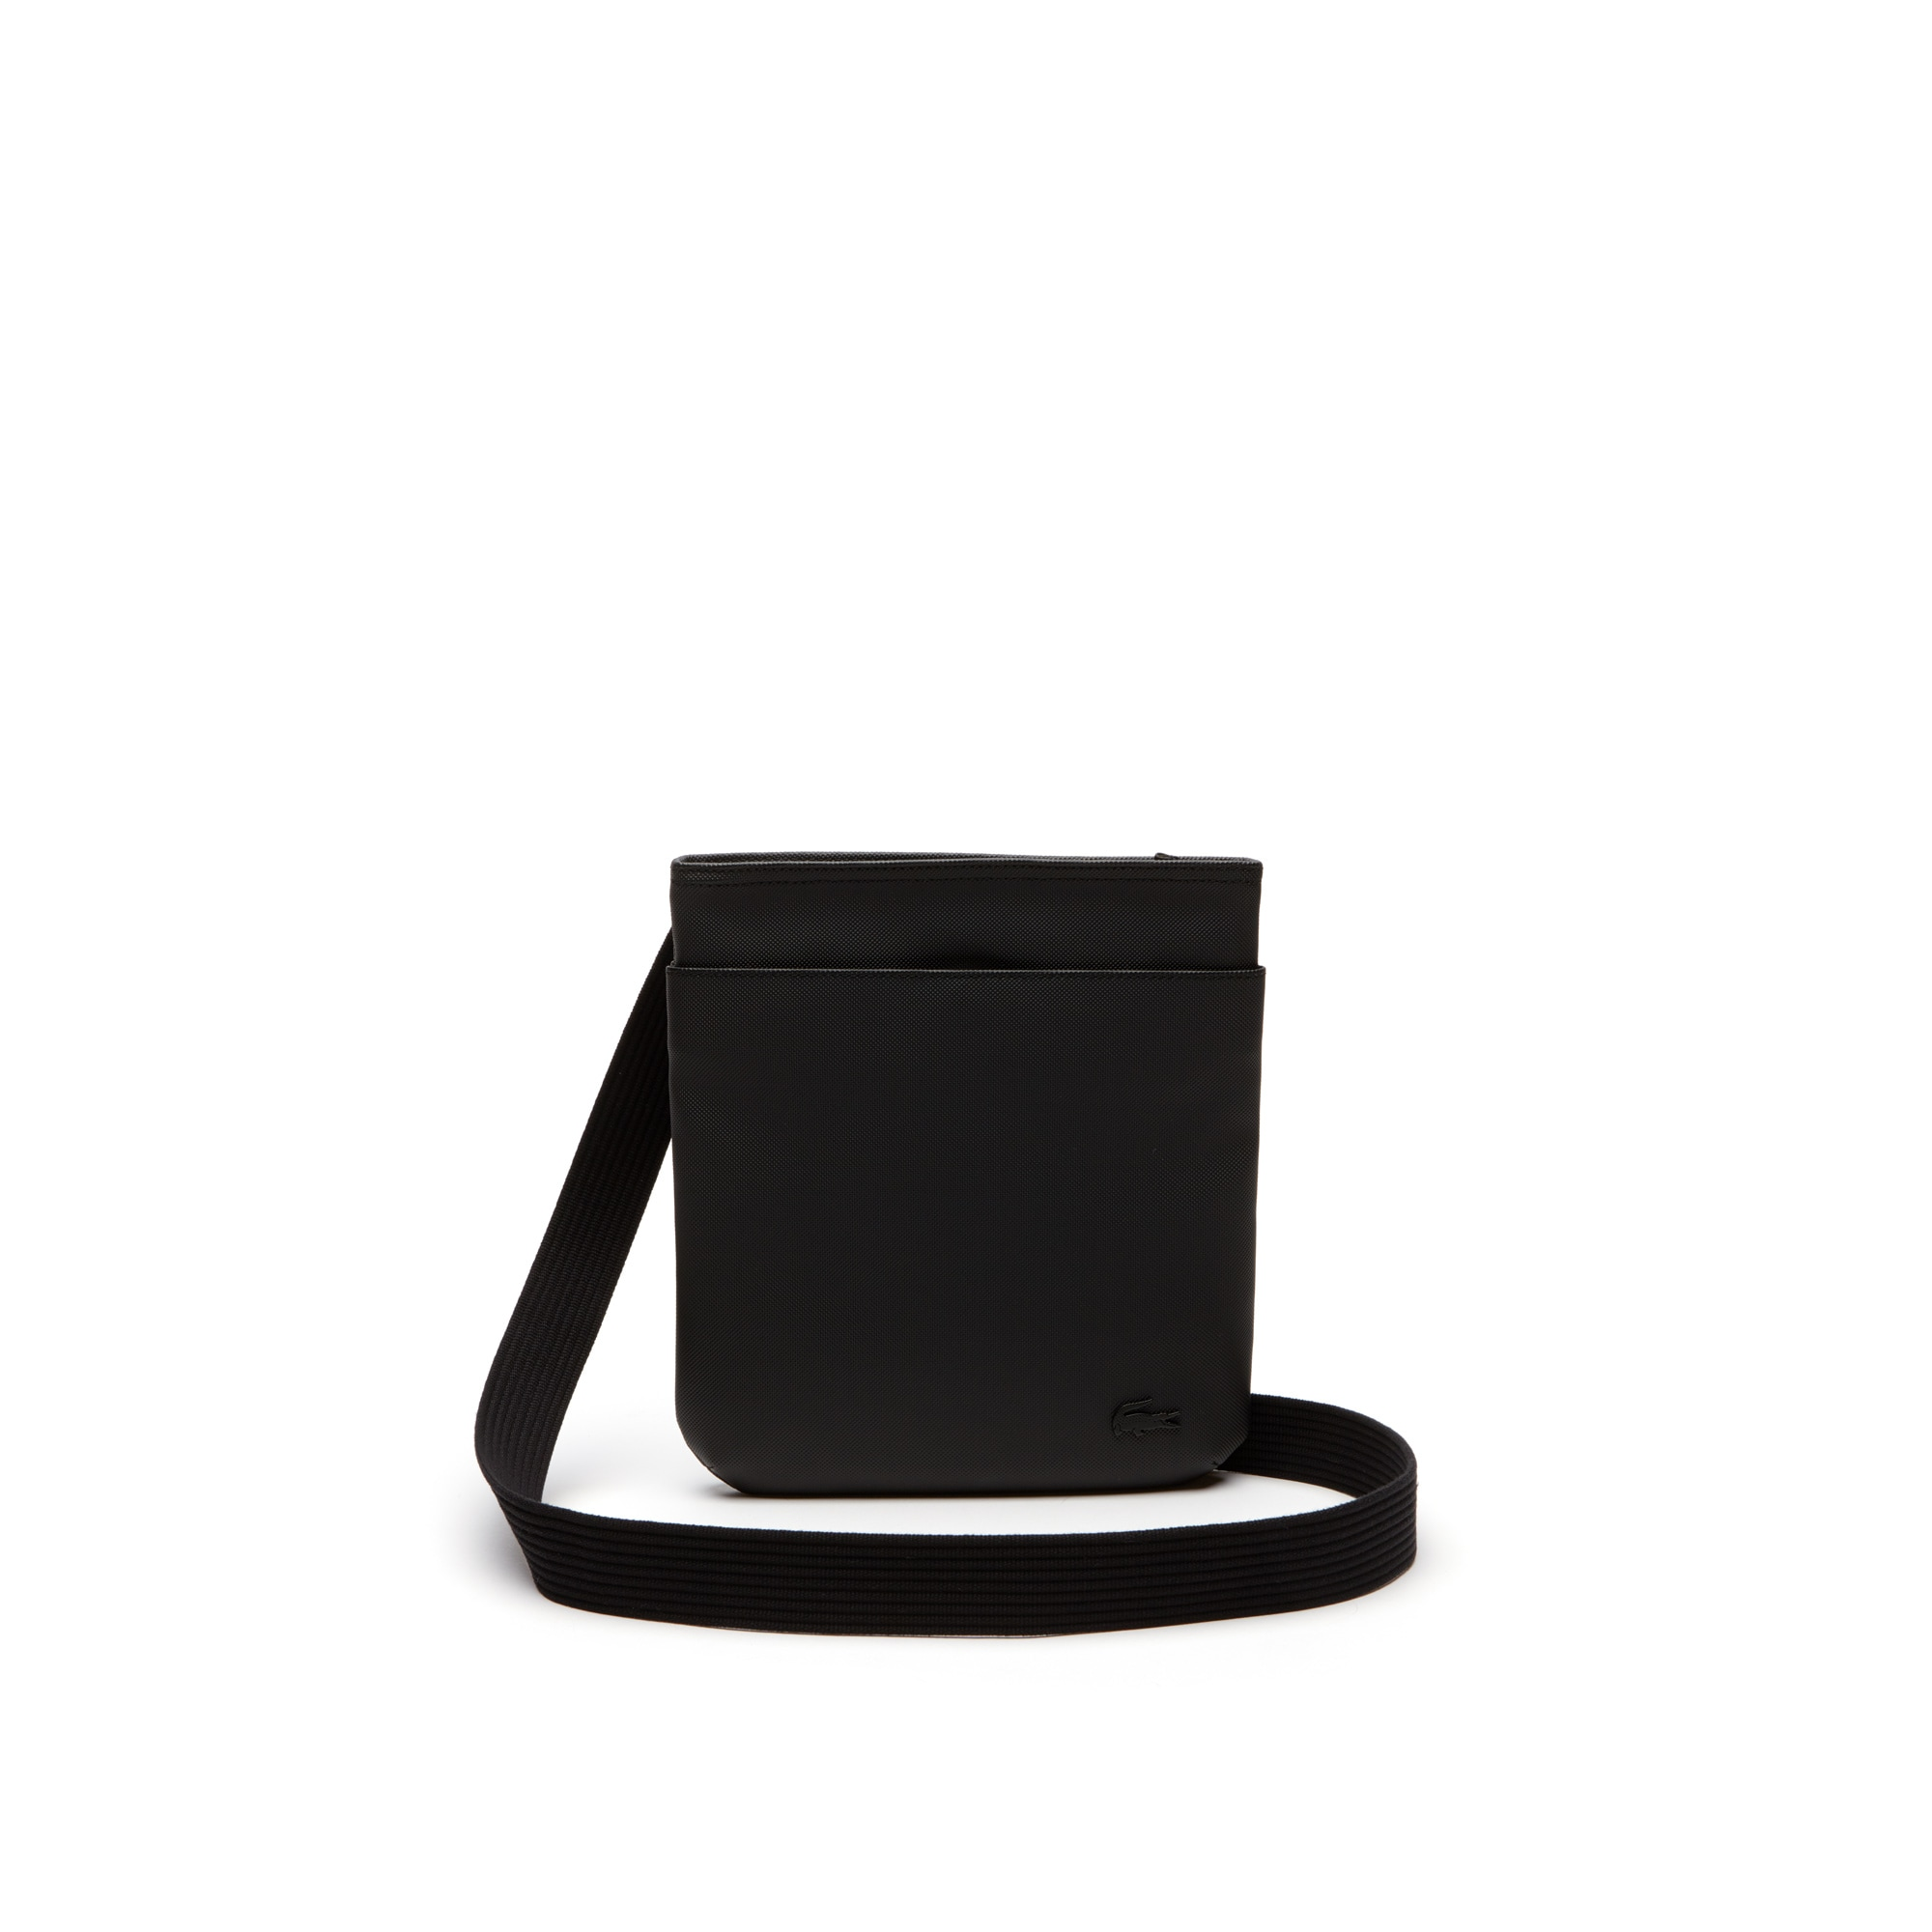 Lacoste - Flache Herren-Tasche CLASSIC aus Petit Piqué - 1